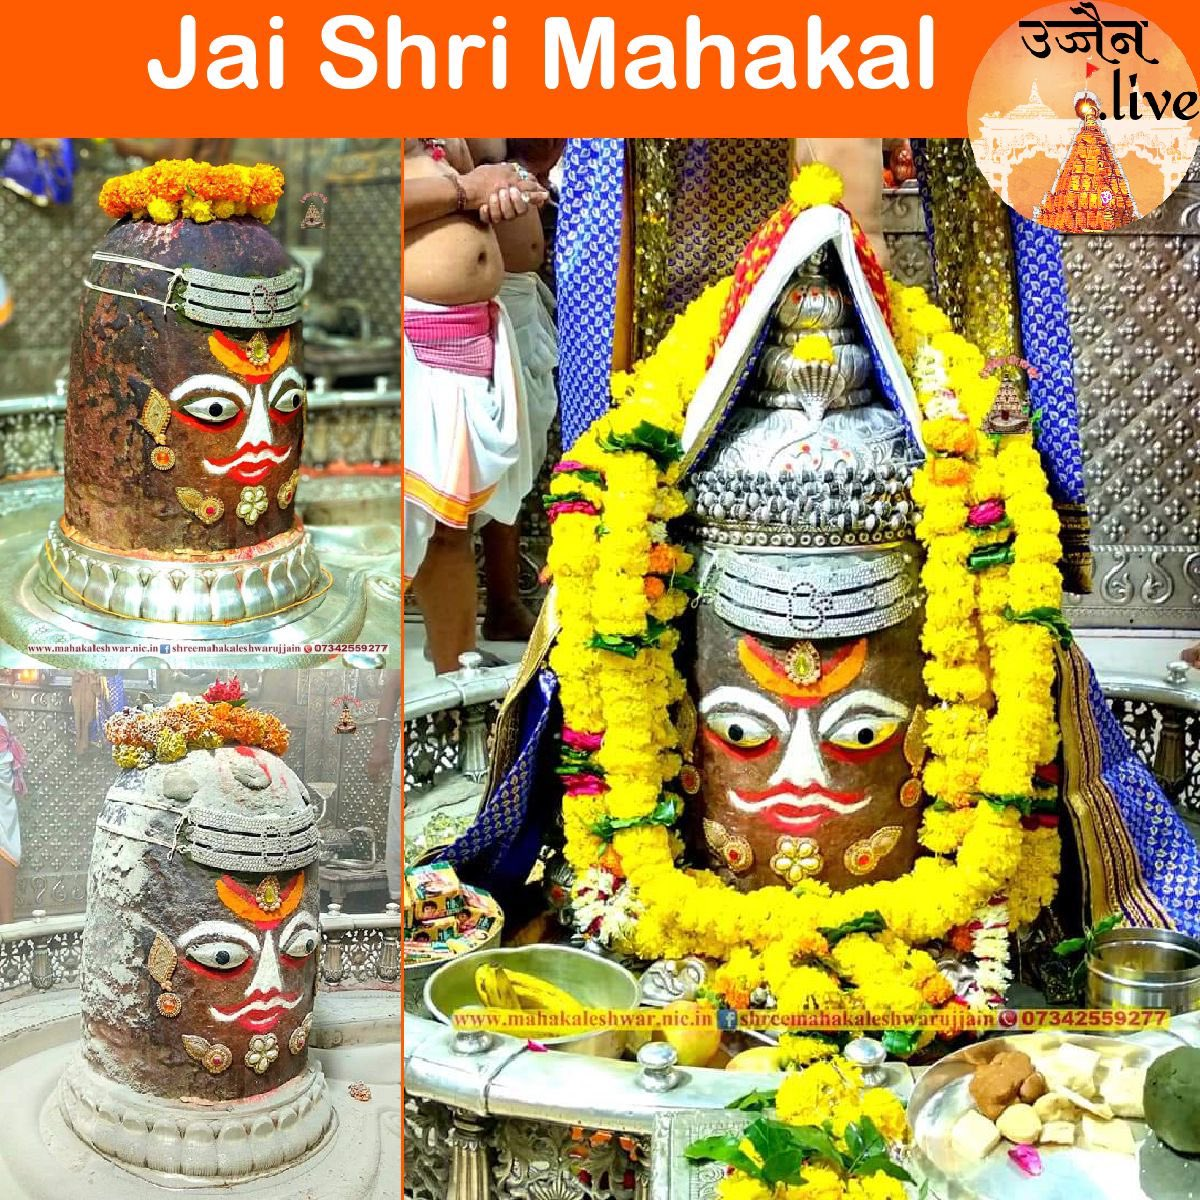 Oct 20: Bhasma Aarti darshan of Shree #Mahakaleshwar #Ujjain #shiv #shiva #bholenath #mahadev #हर_हर_महादेव #jaibholenath #jaimahakal #om #omnamahshivay #harharmahadev  #mahakal #goodmorning #TuesdayVibes  #Incredibleindia  @HinduTempleLive @BharatTemples_ https://t.co/TPkwtWaHso